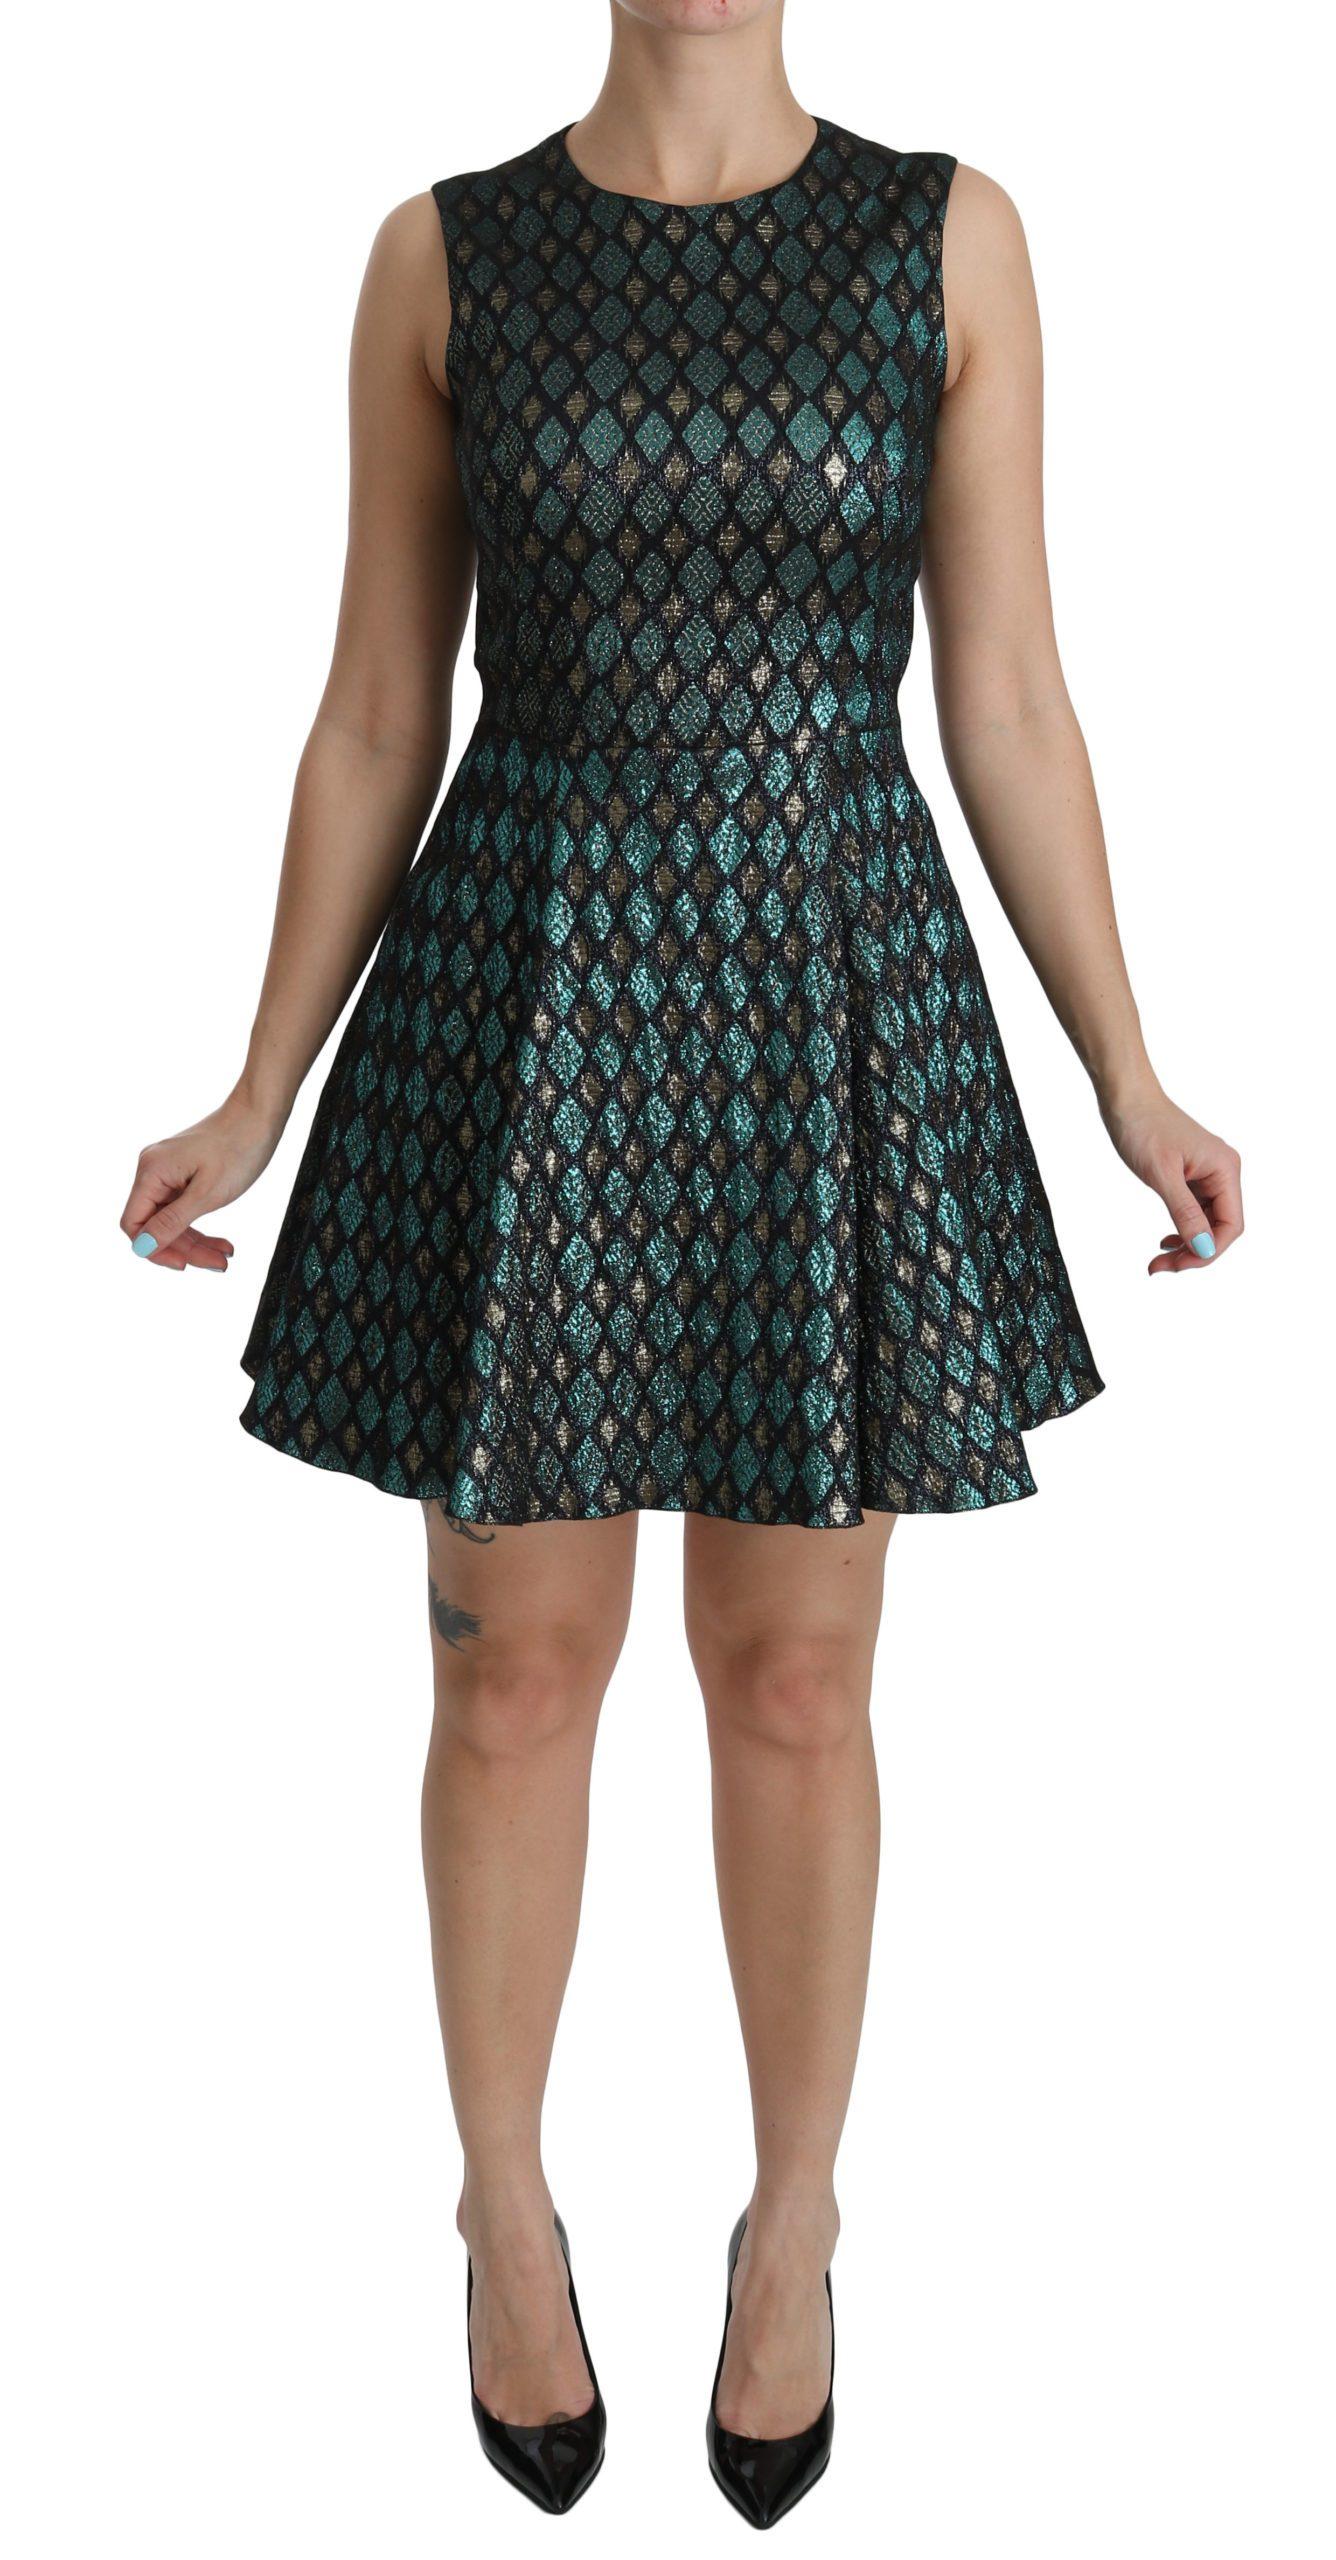 Dolce & Gabbana Women's A-line Shift Gown Dress Blue DR2048 - IT40|S